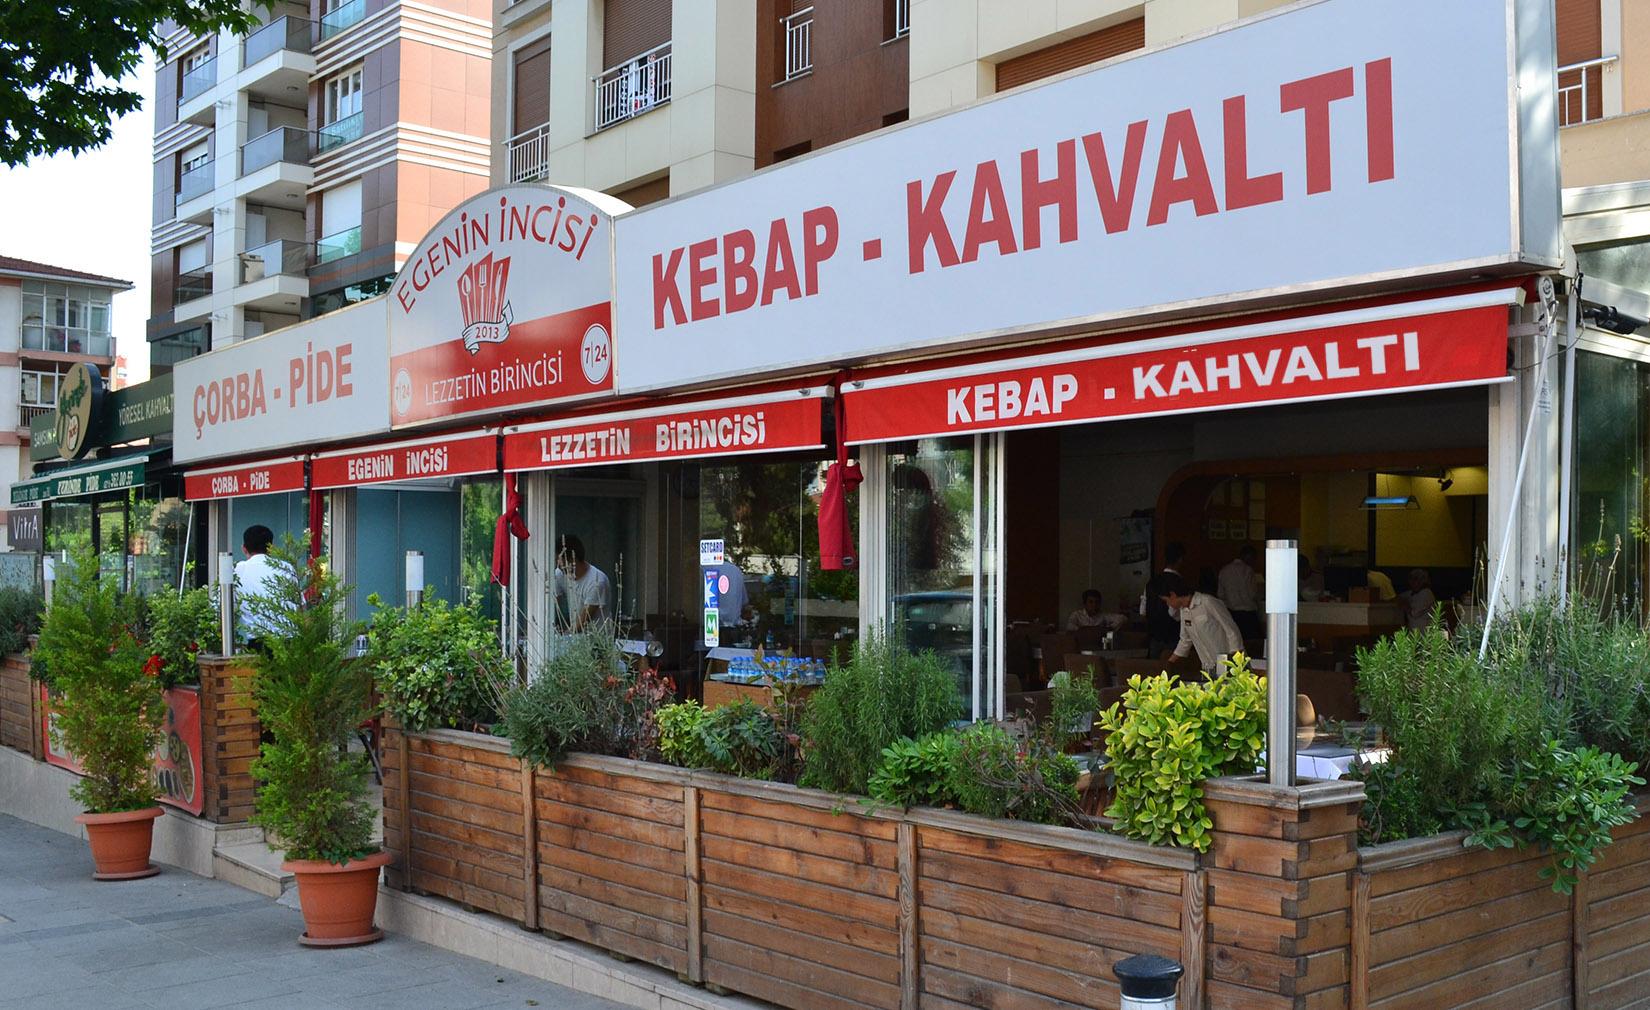 egenin-incisi-restaurant